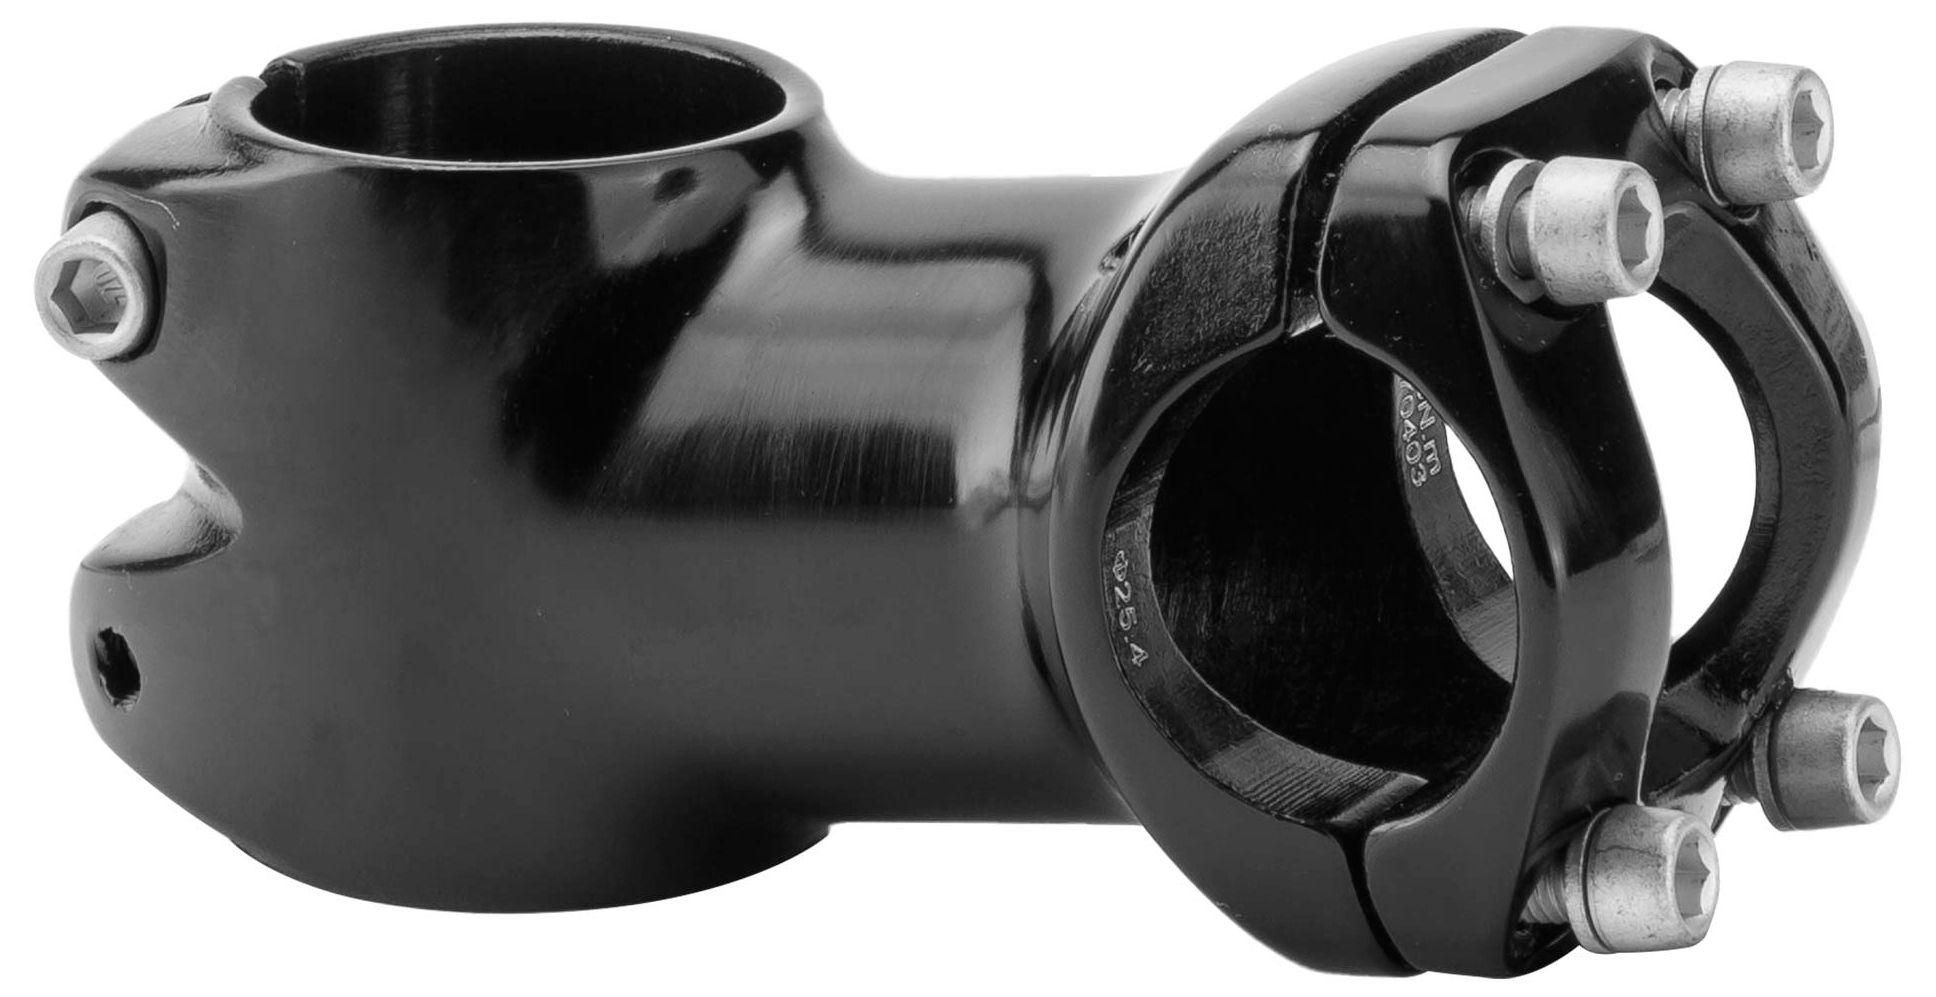 Запчасть Stels SM-M003 SM-M003 1-1/8 х 60 мм х 25,4 мм